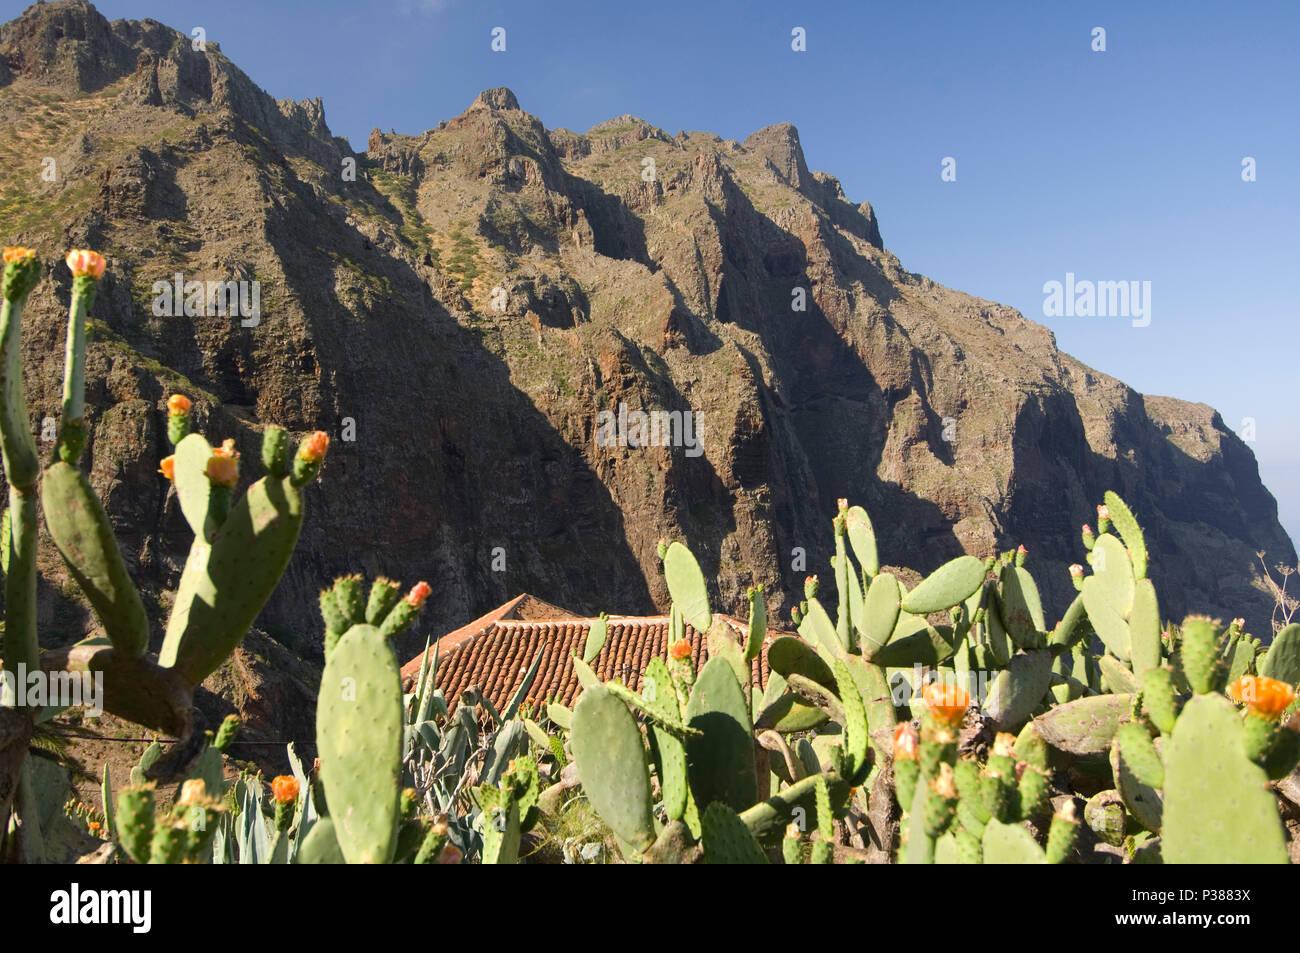 Masca, Spanien, Landschaft im Teno Gebirge in Teneriffa. Stockbild